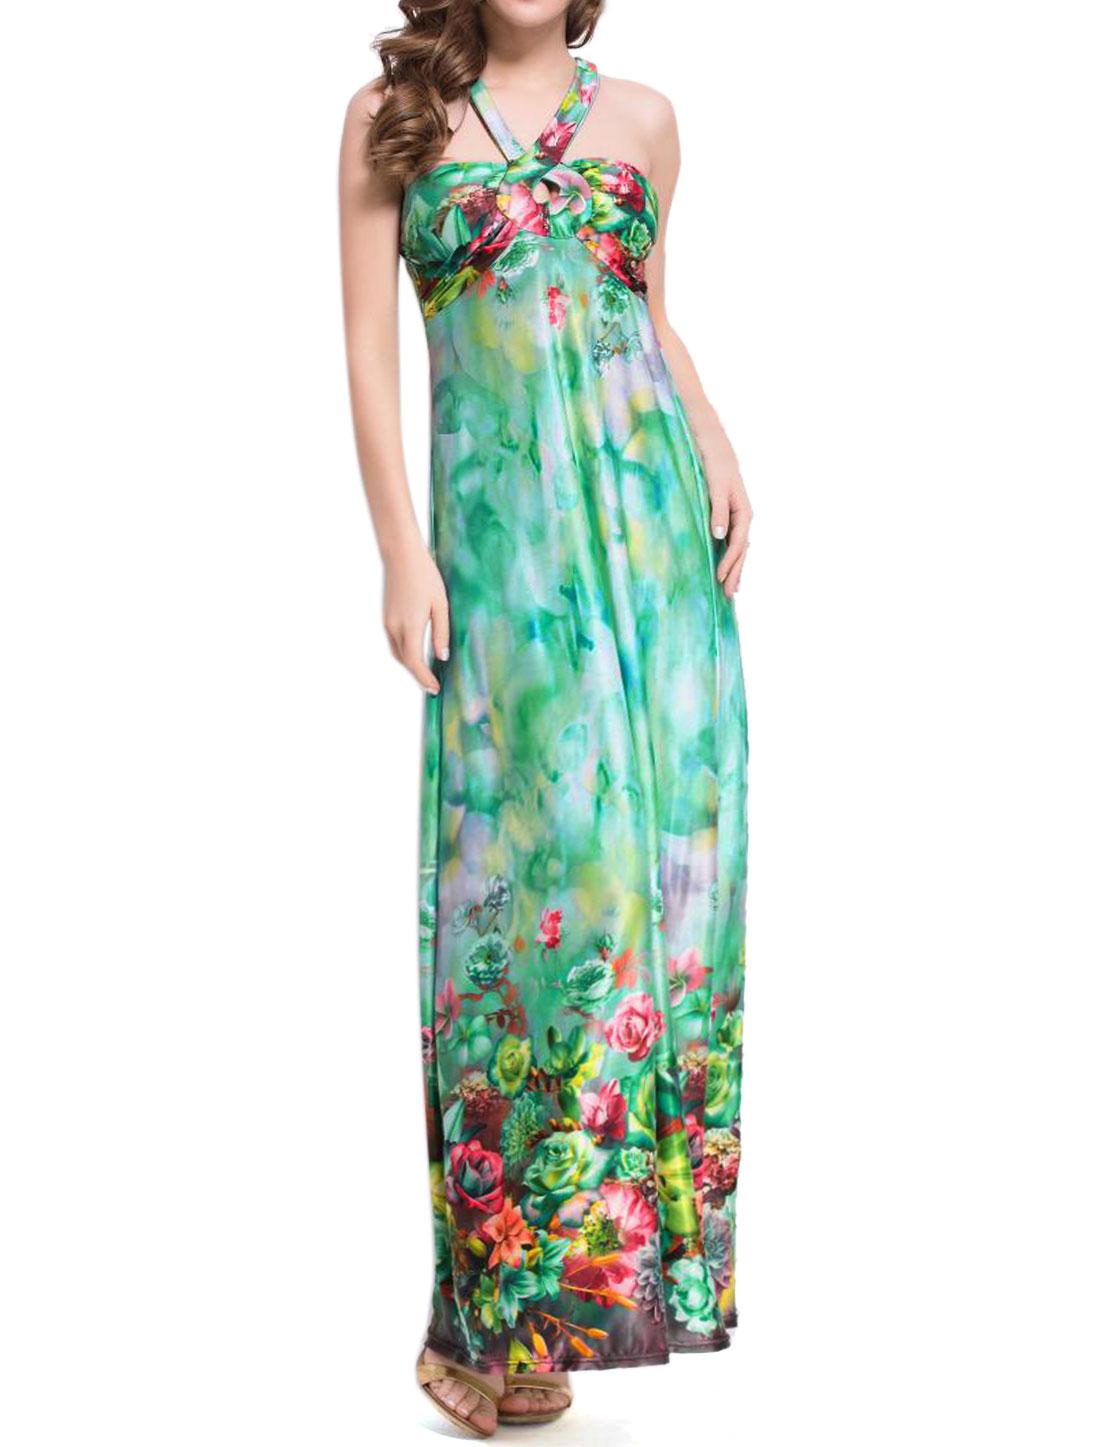 Women Halter Neck Padded Bust Floral Maxi Dress Green XS